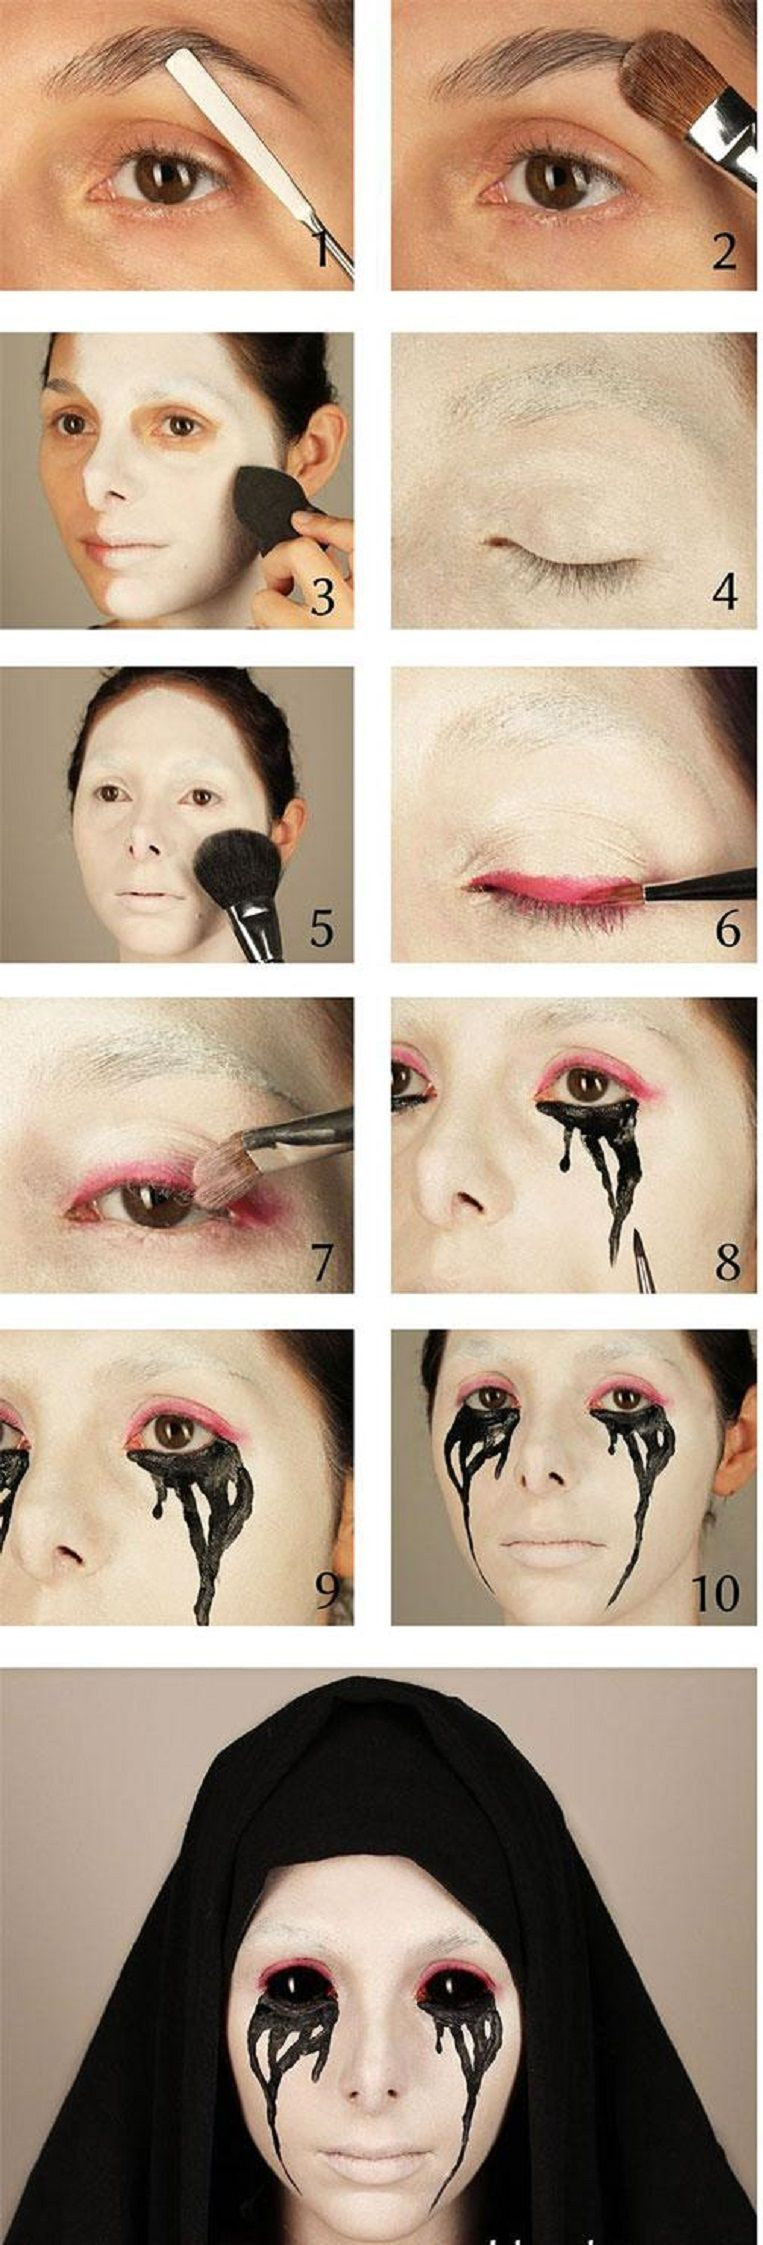 Halloween makeup tutorial scary makeup 12 best diy halloween halloween makeup tutorial scary makeup 12 best diy halloween makeup tutorials gleamitup baditri Image collections